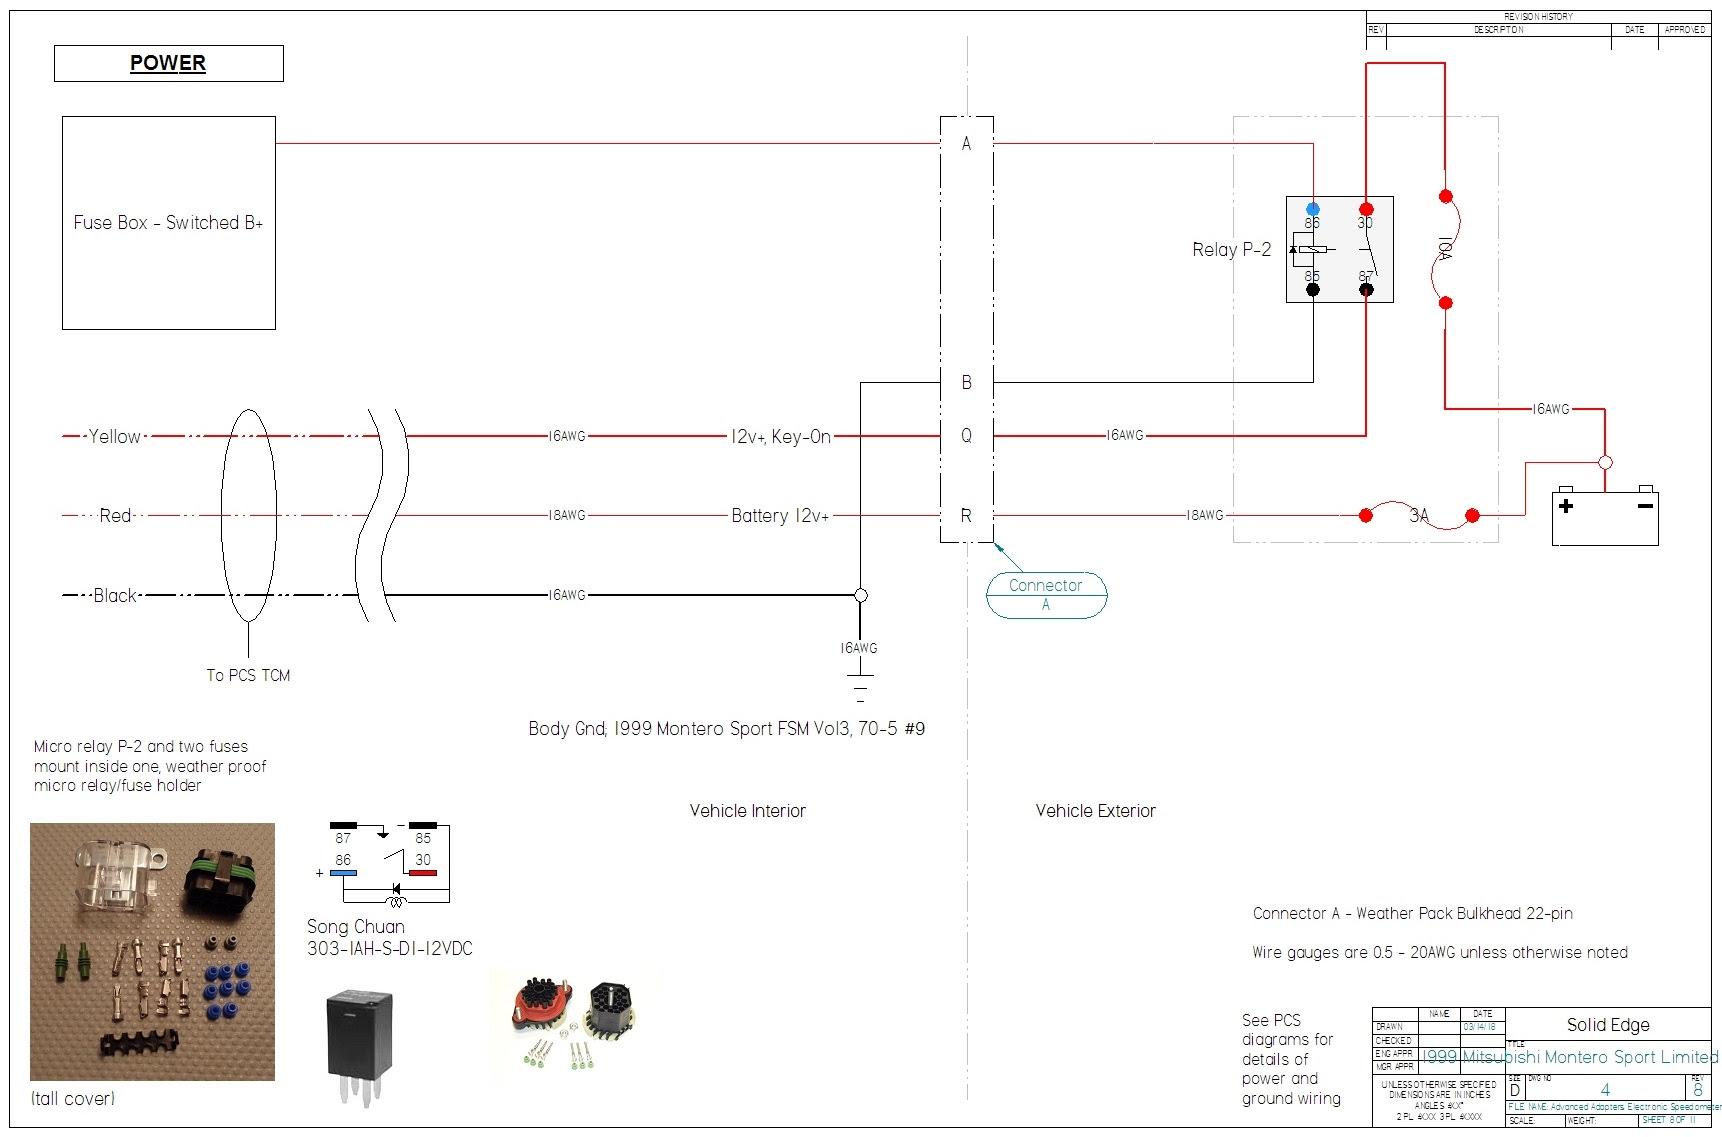 Wiring Diagram For Mitsubishi Montero Sport